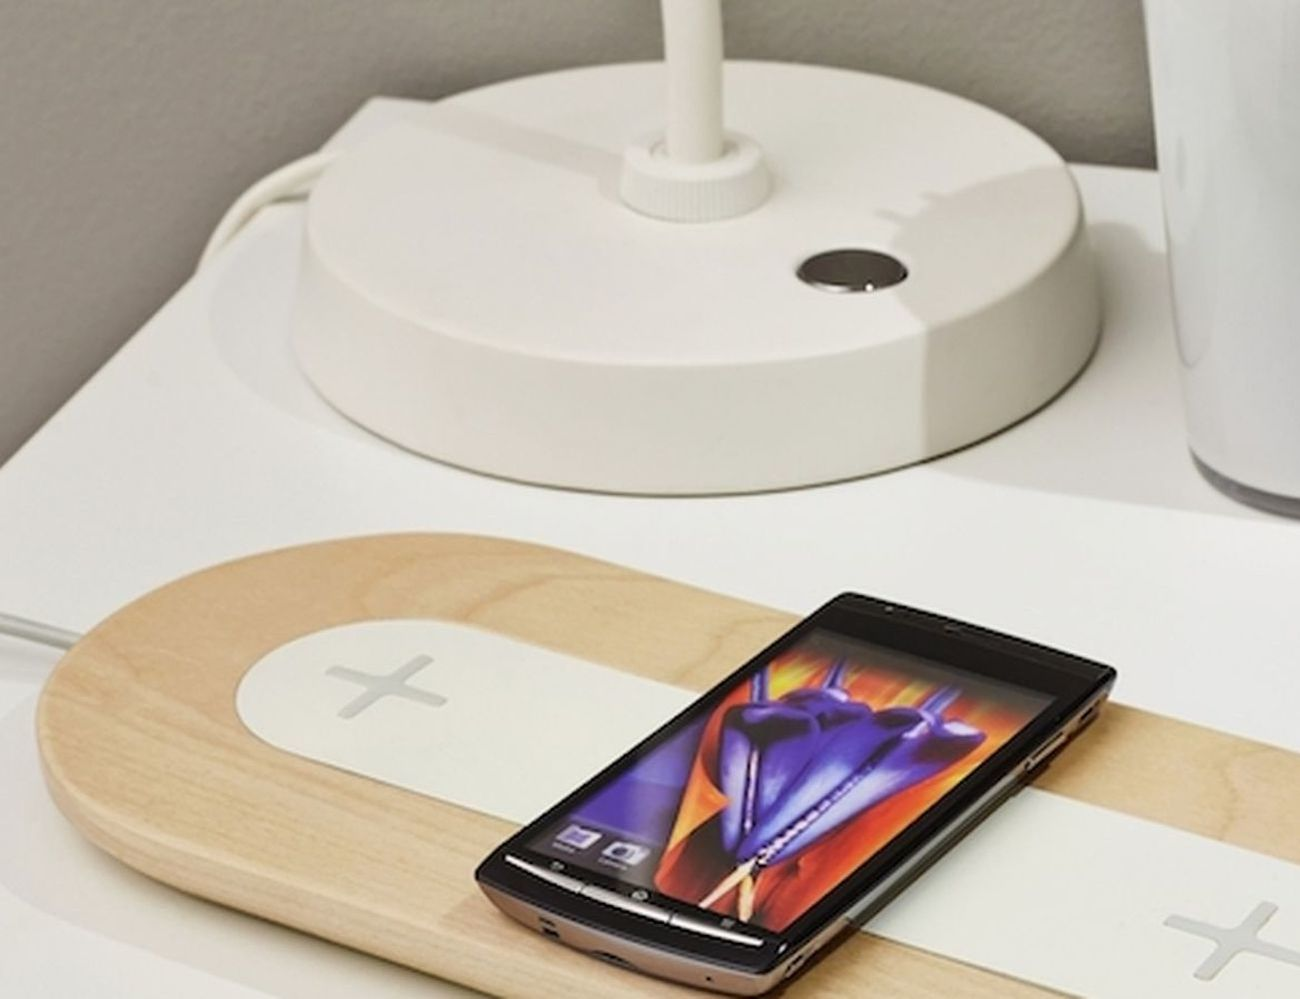 Ikea Nordmärke Triple Wireless Charging Pad